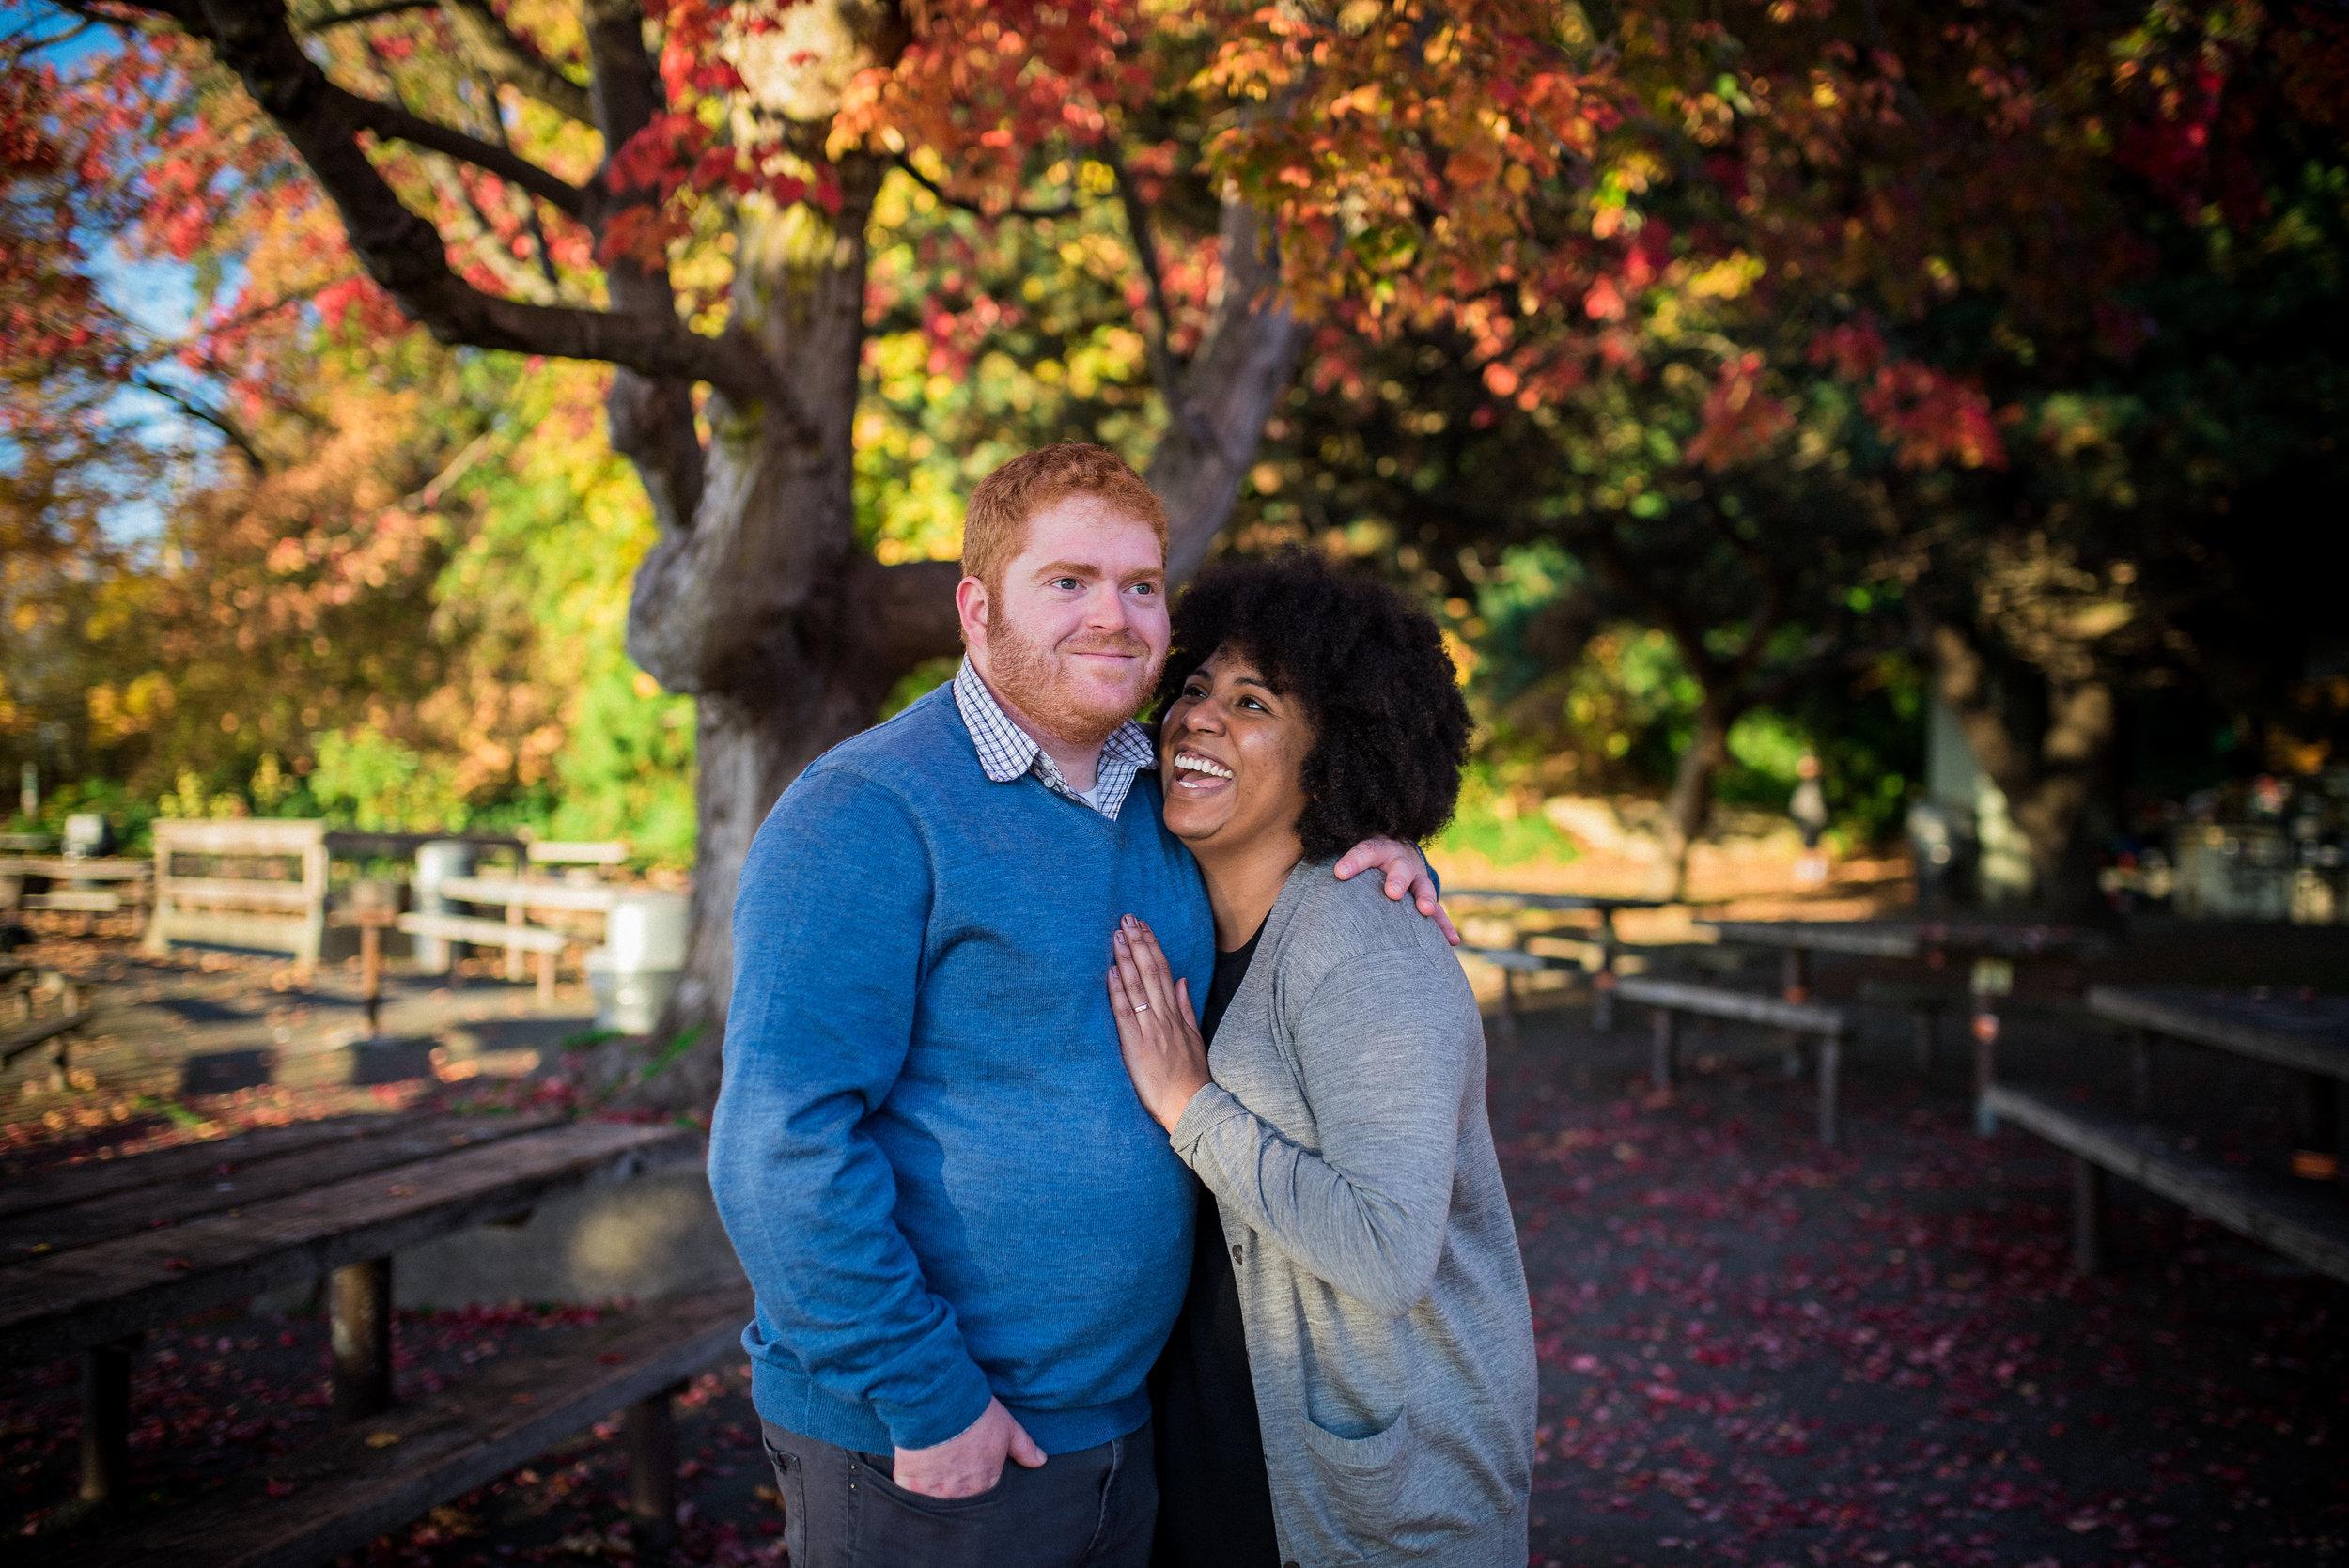 J&J-9063.jpgSeattle Engagement - Seattle Wedding Photographer - North Carolina Wedding Photographer